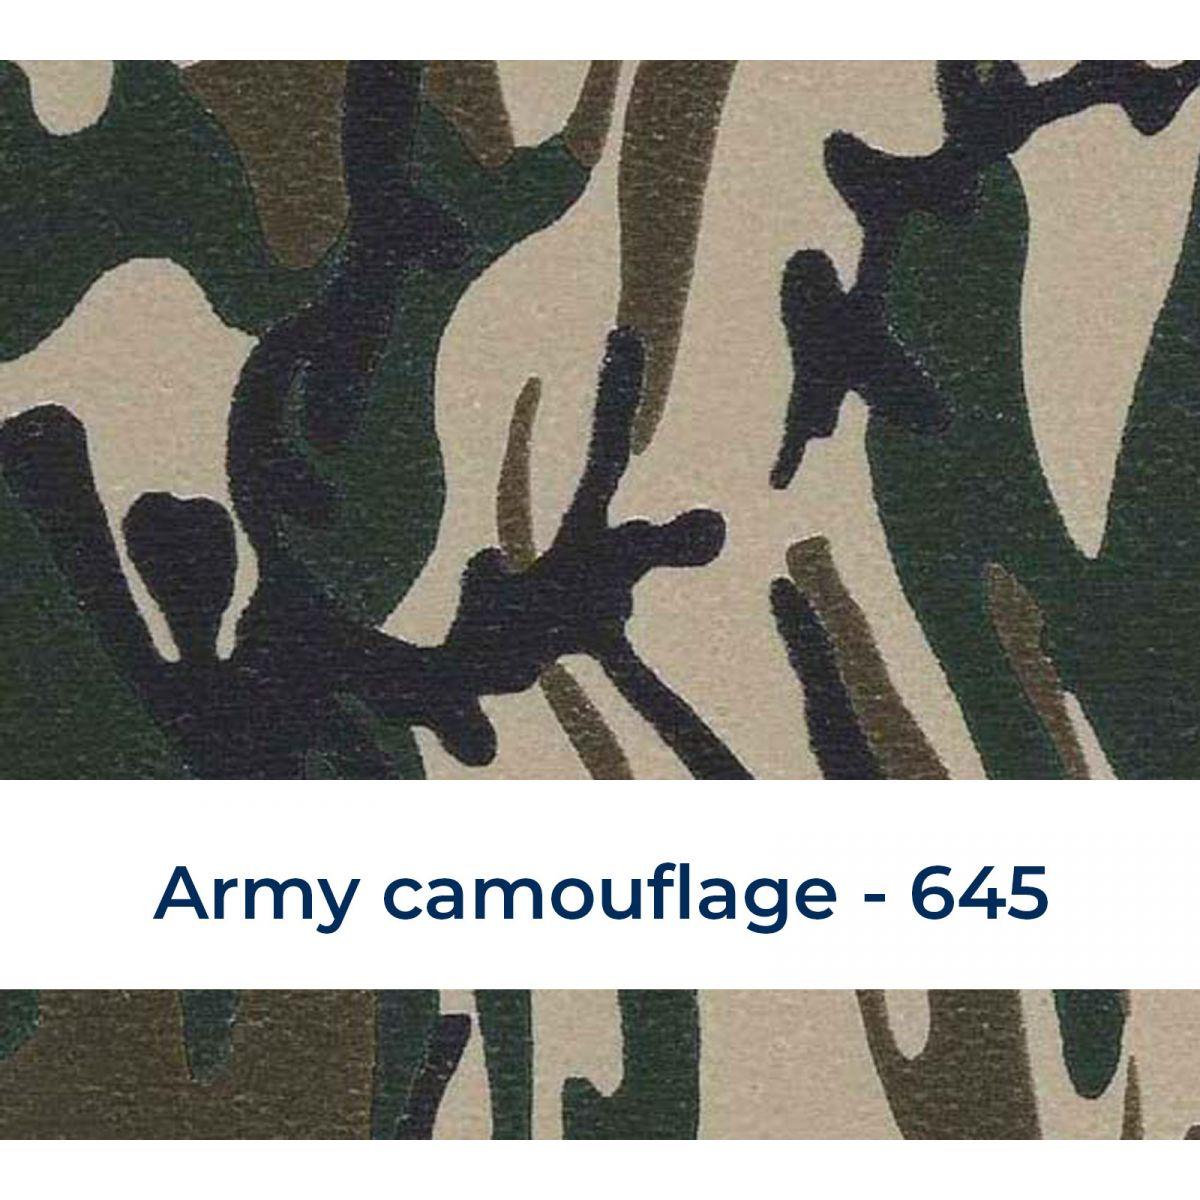 Fashion Army camouflage 645